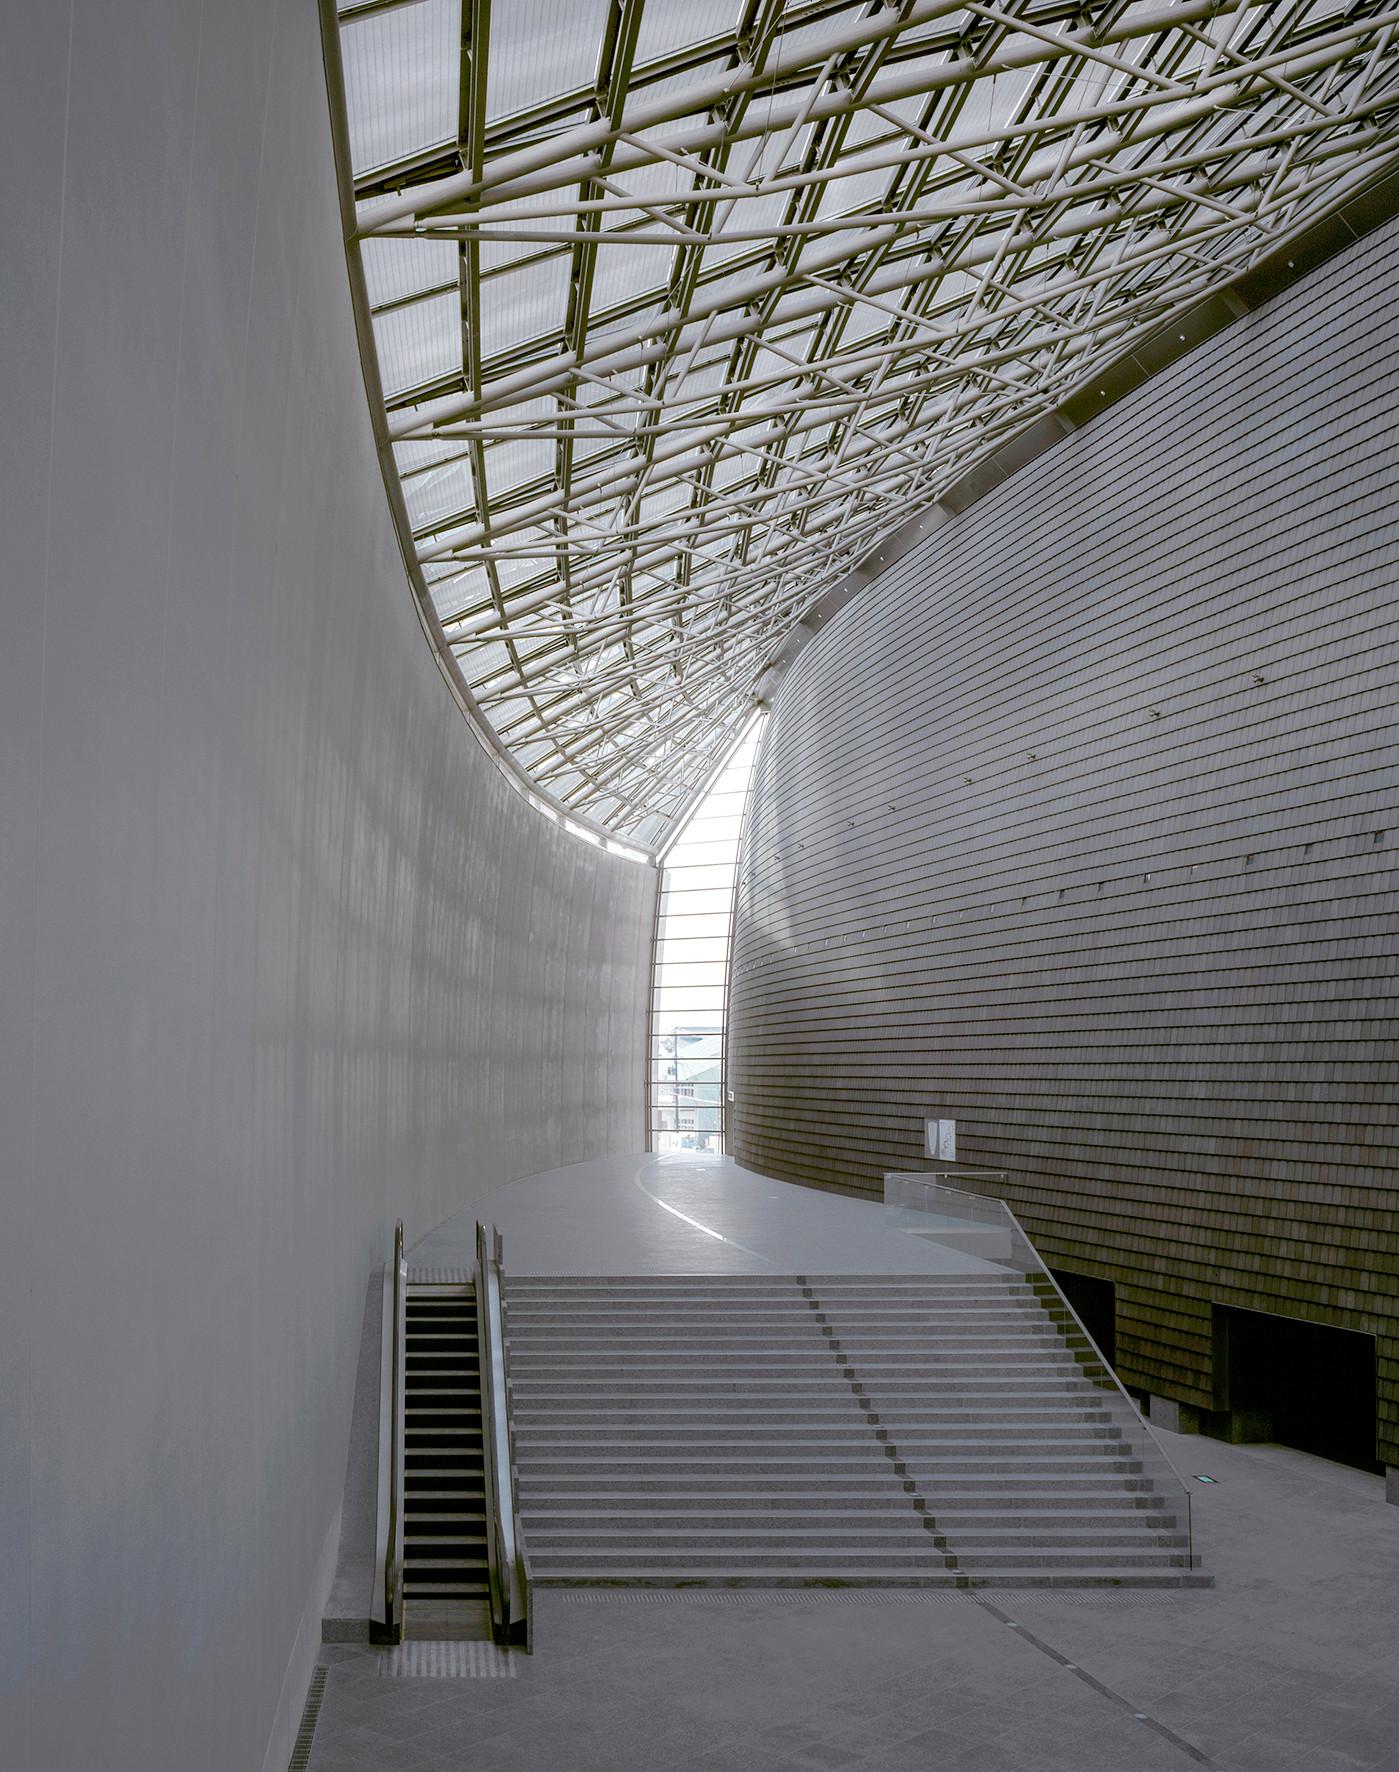 Nara Centennial Hall | ©Hisao Suzuki